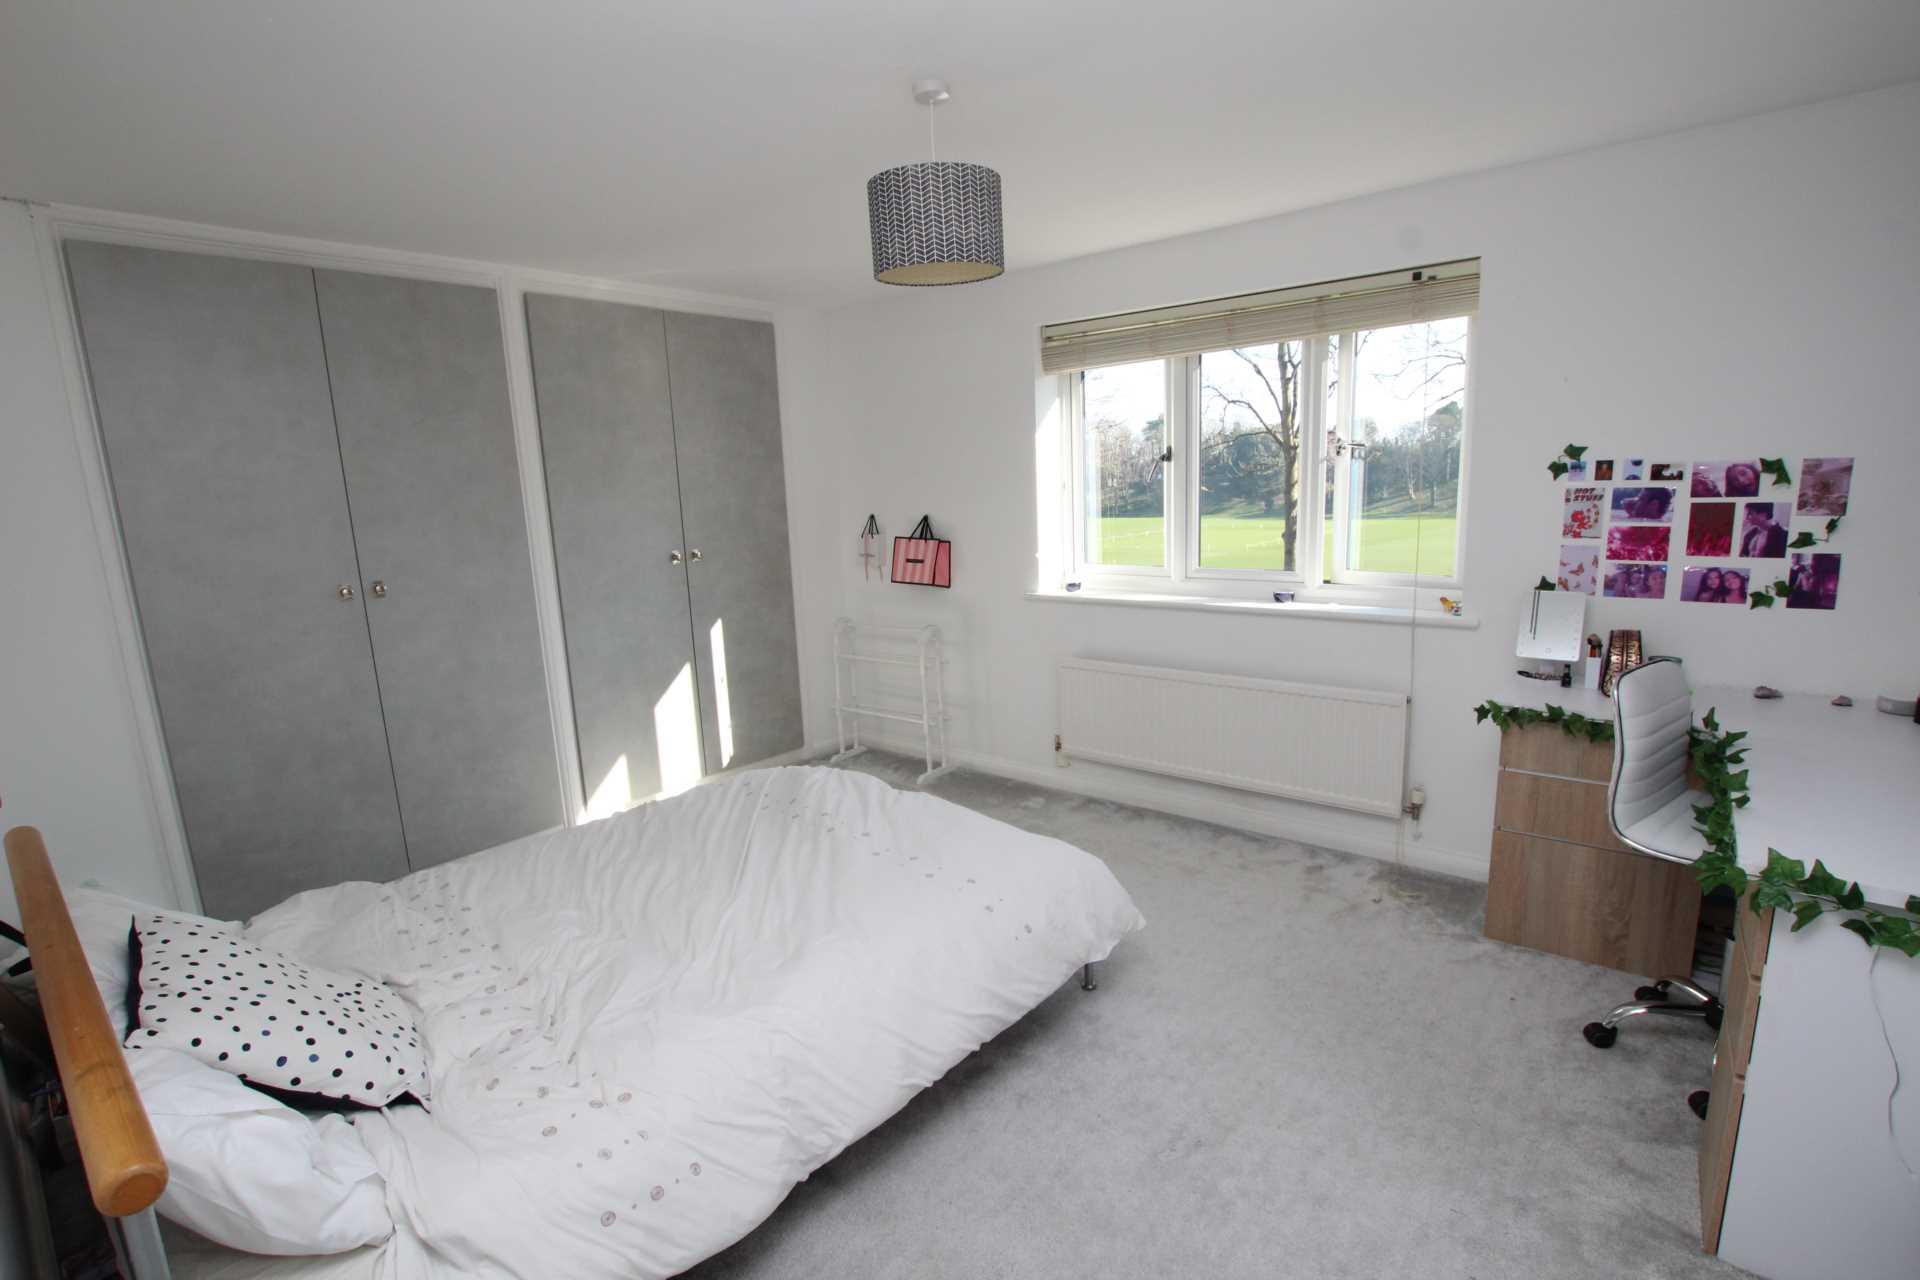 Rectory Close, Eastbourne, BN20 8AQ, Image 13